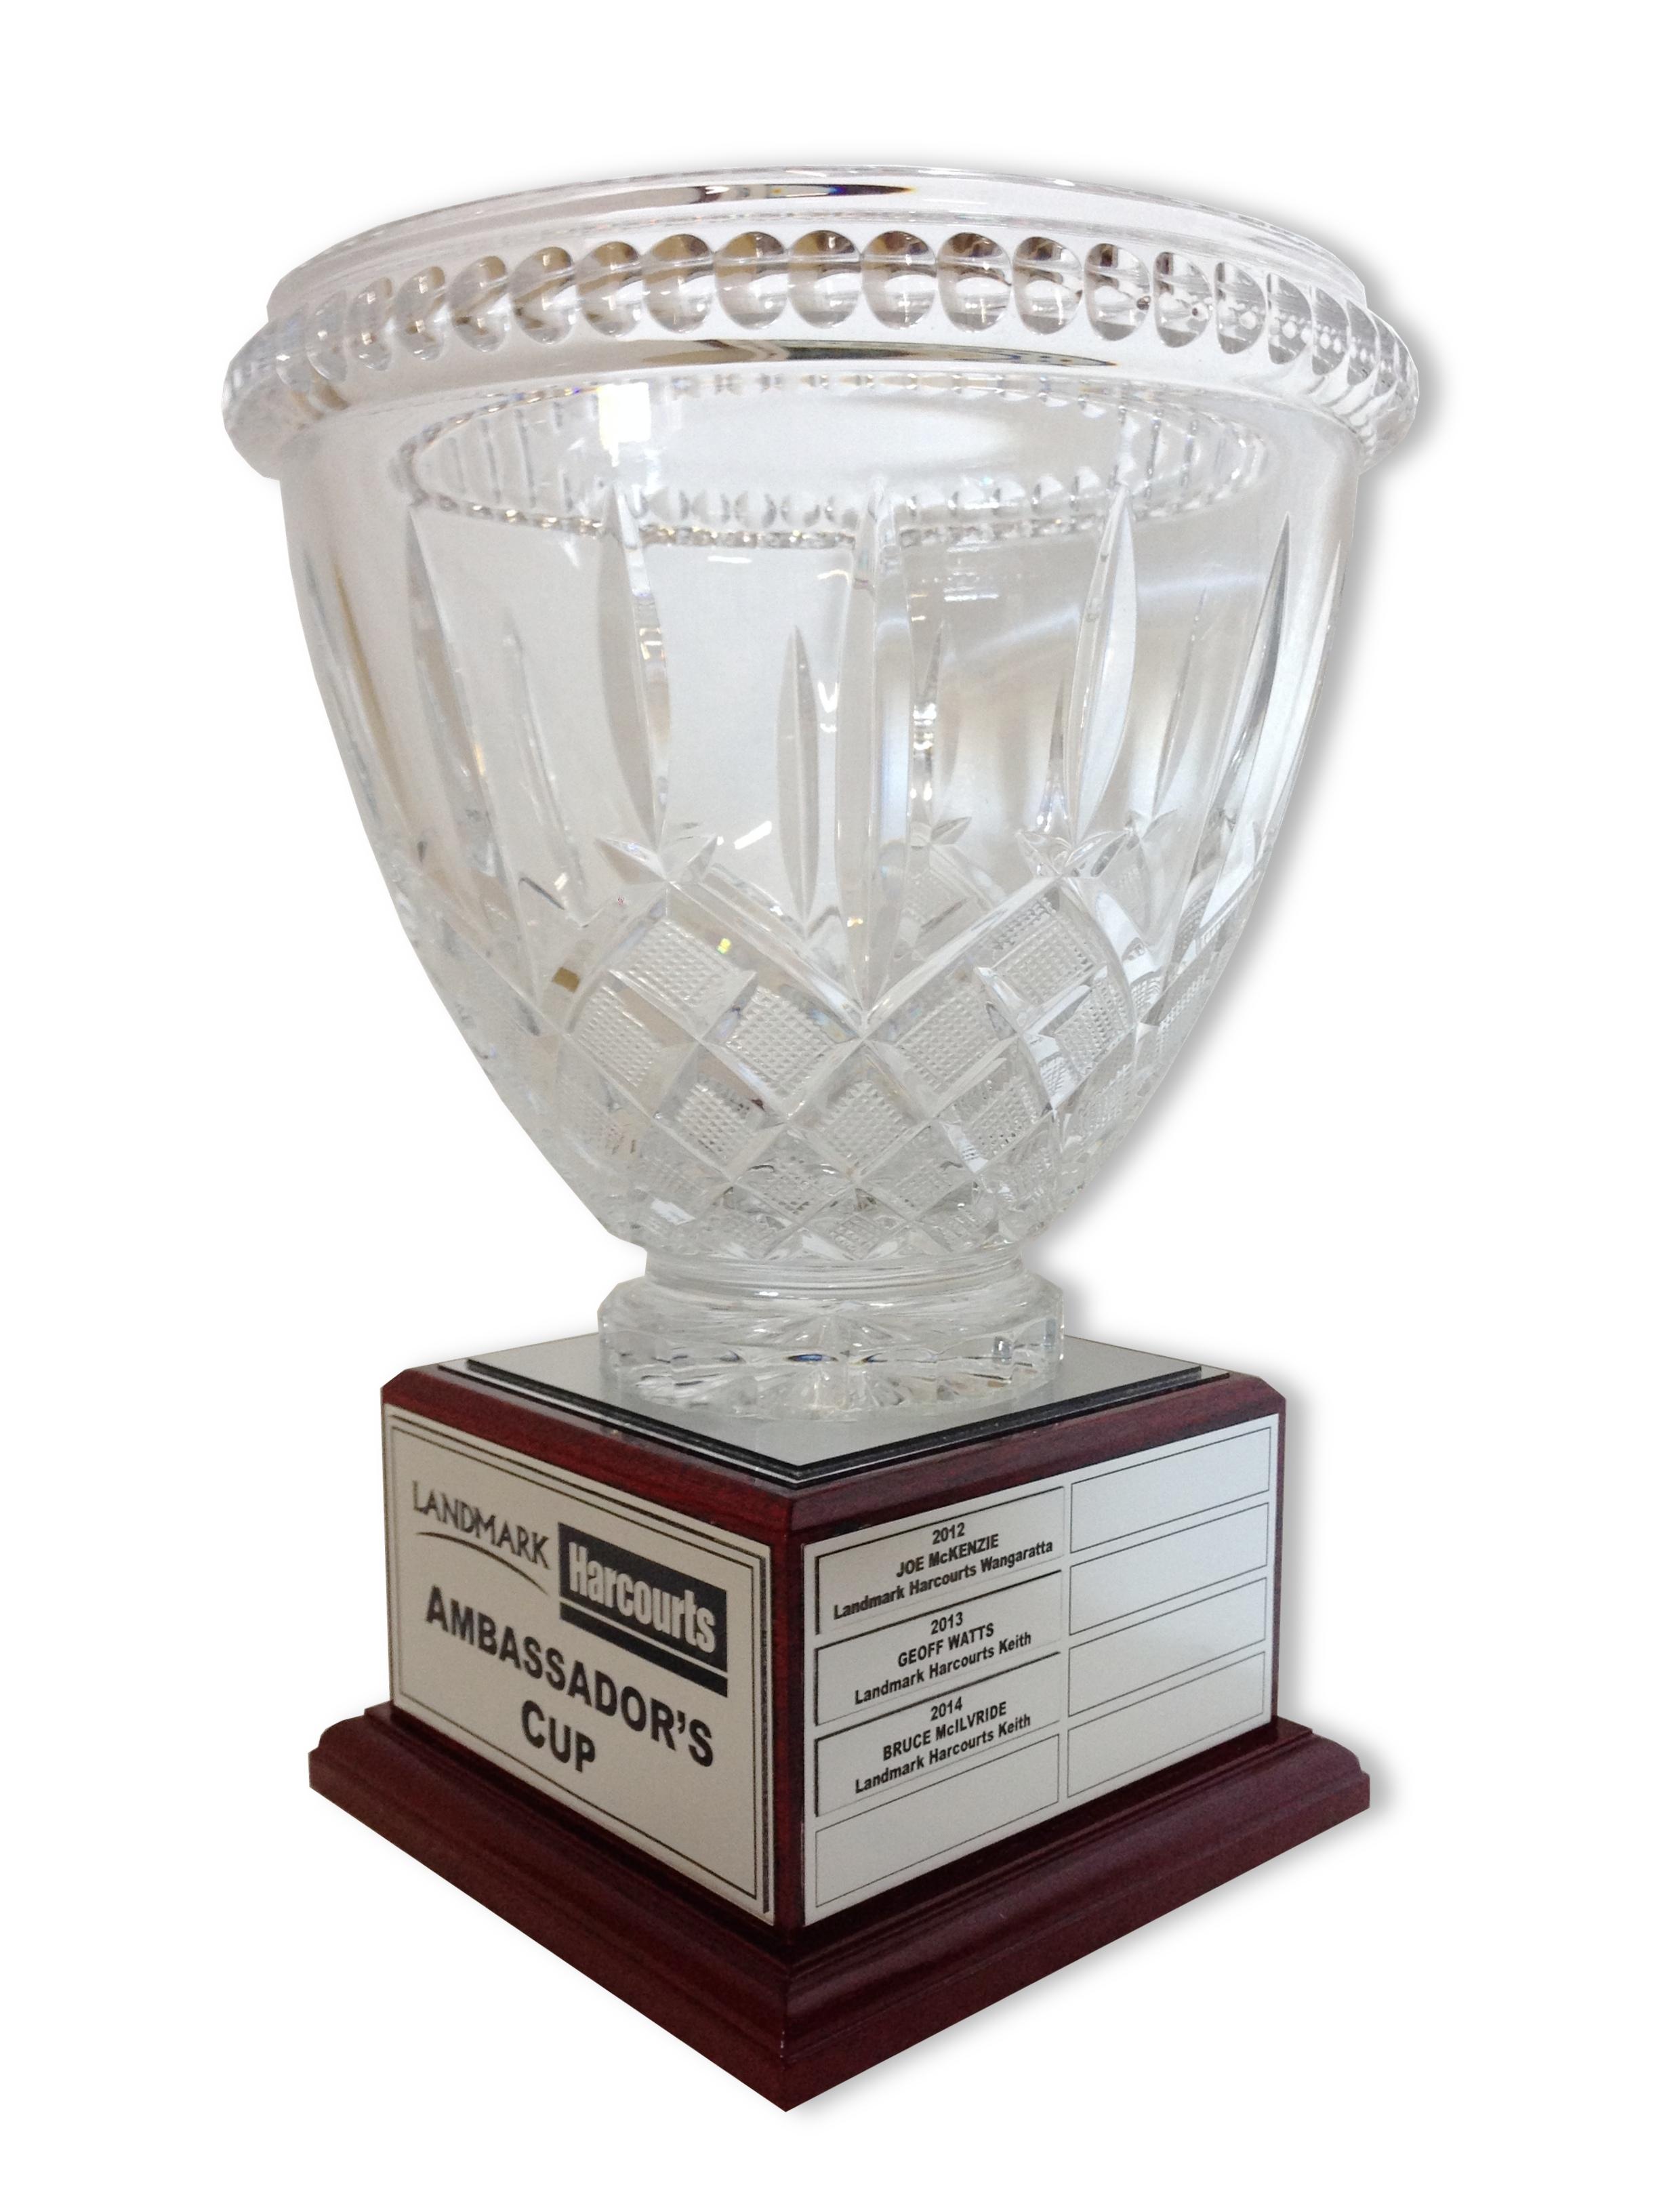 Landmark Harcourts - Ambassador's Cup.jpg